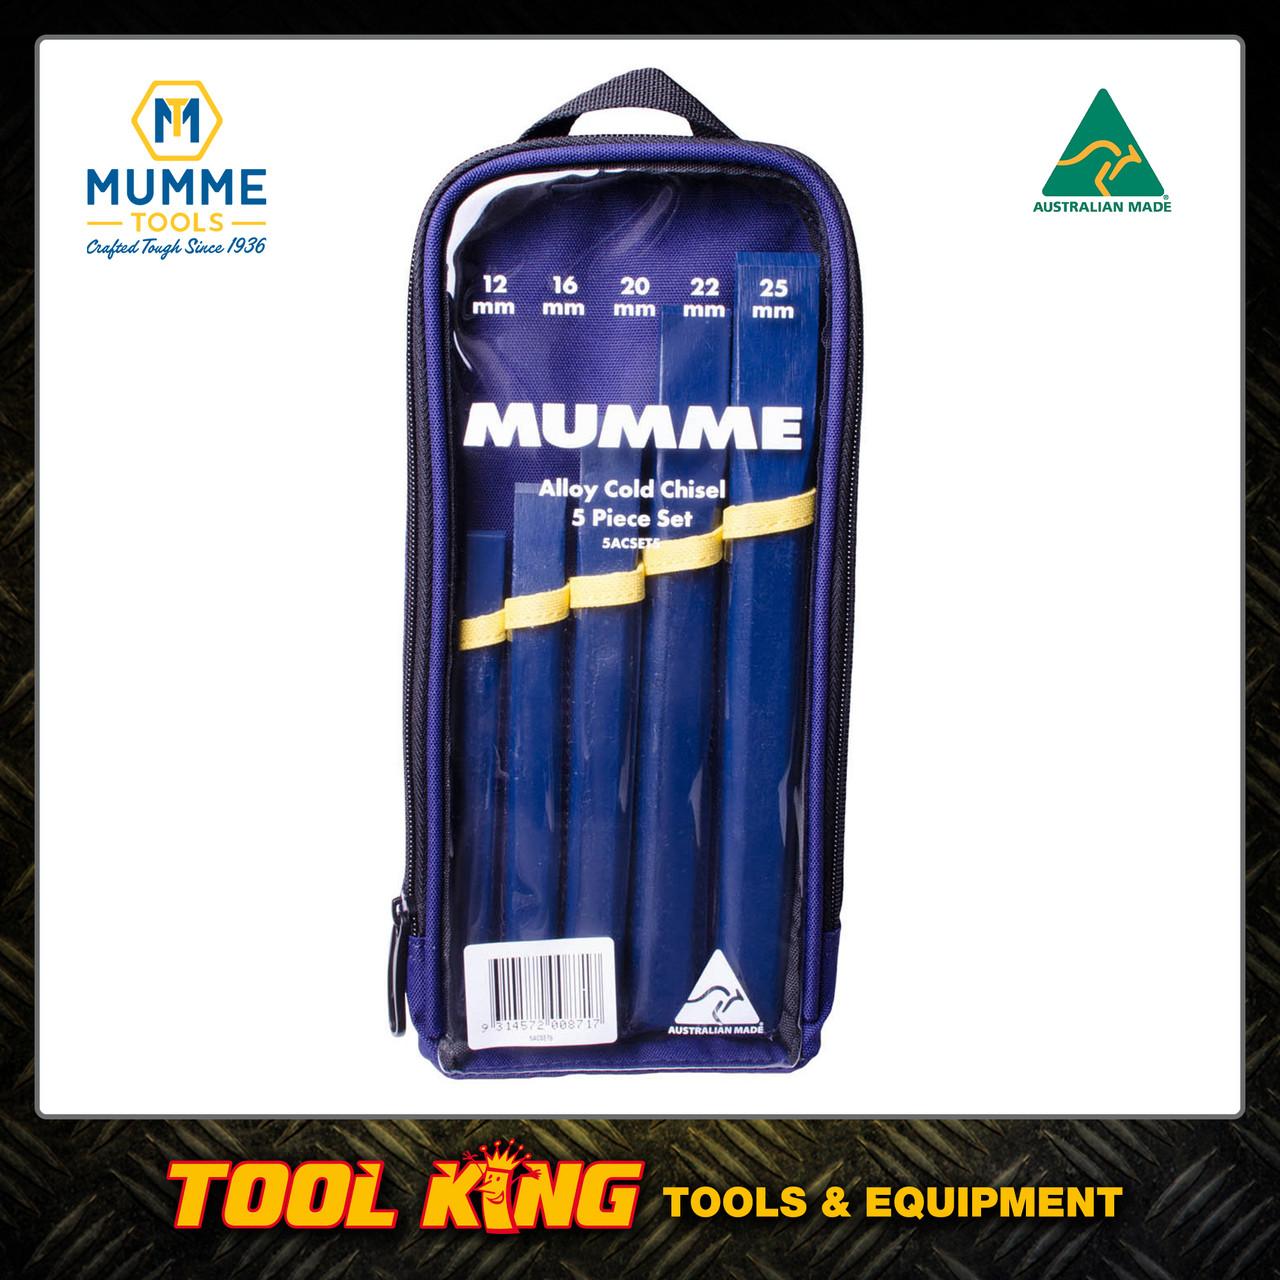 5pc Cold Chisel set Alloy steel MUMME Australian made